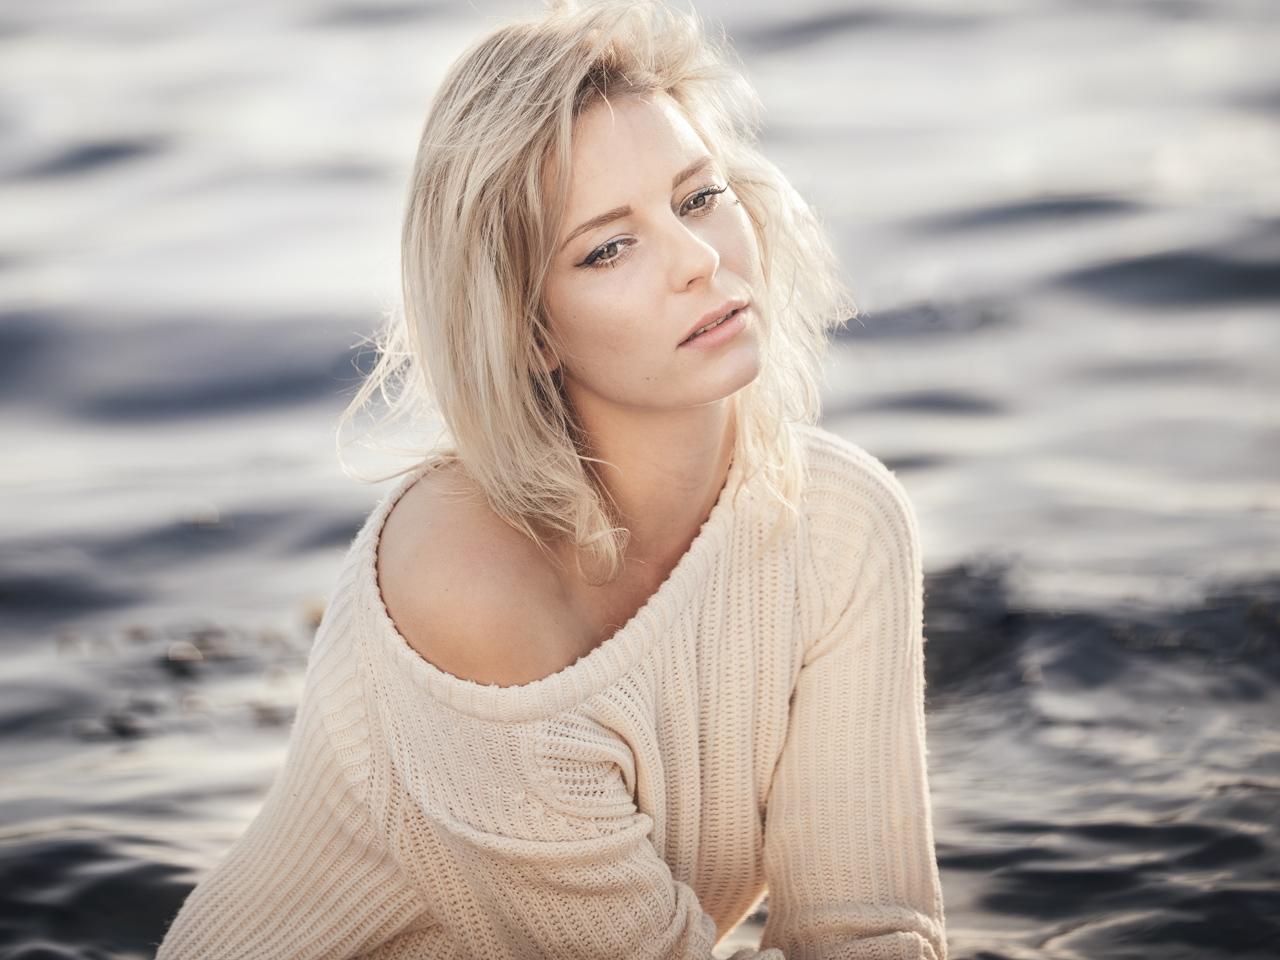 Portraitfotografie Outdoor & Outdoor Modelsharings & Fotokurse im Fotoworkshop Kiel